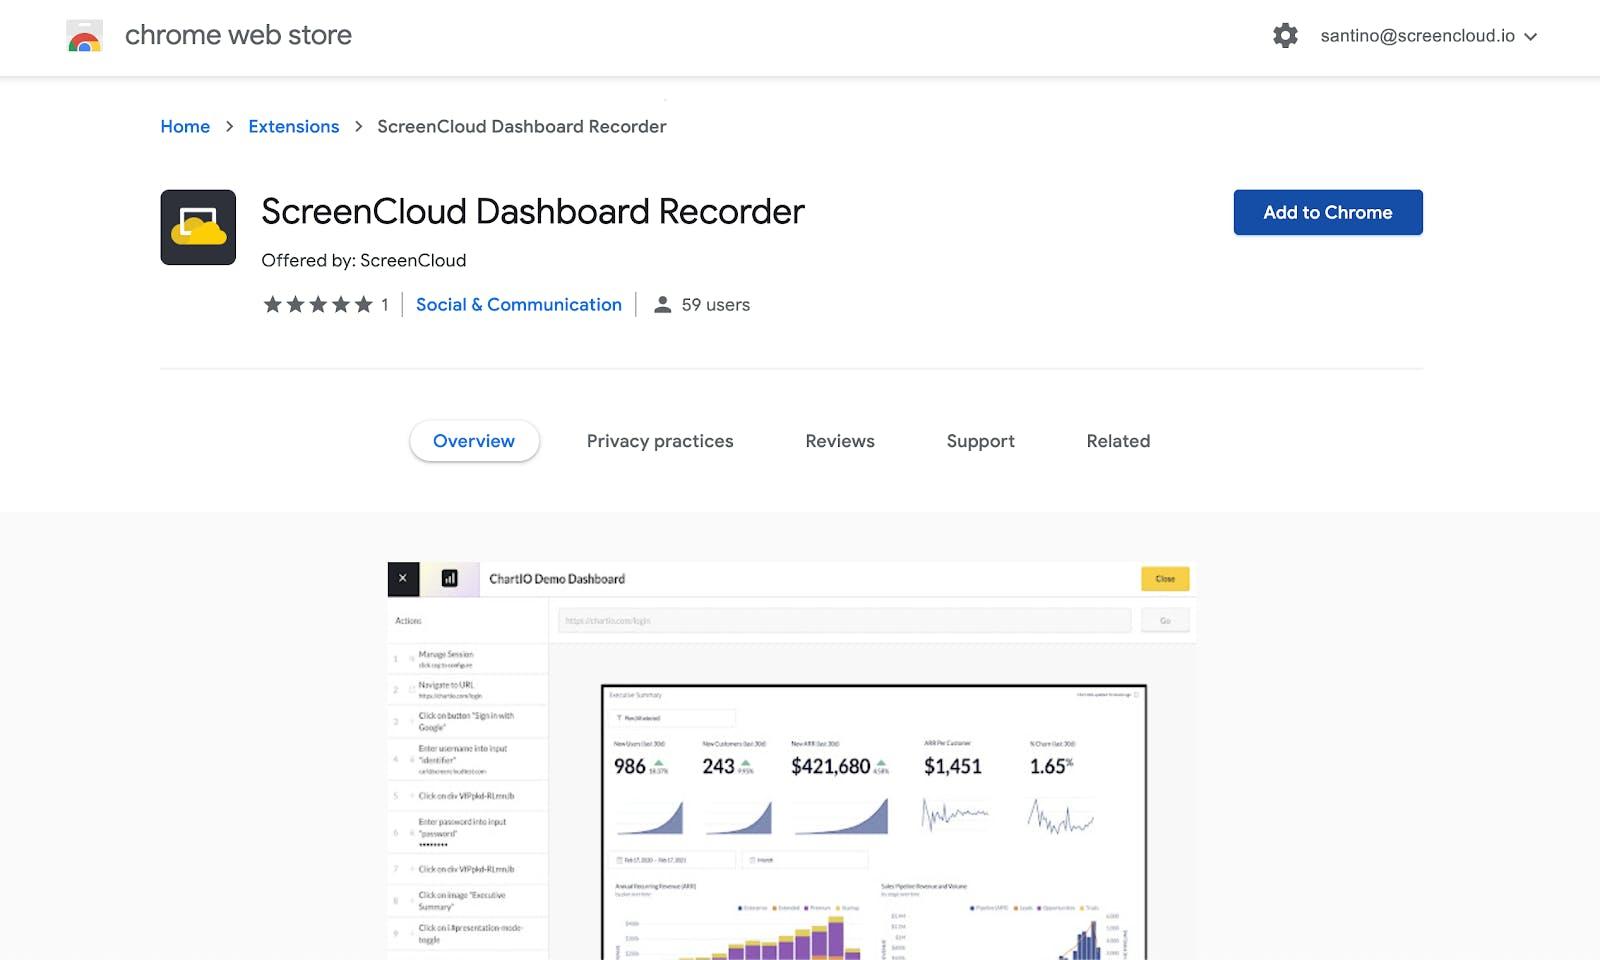 ScreenCloud Dashboard Guide - Chrome web store (1) 2.22.2021.png